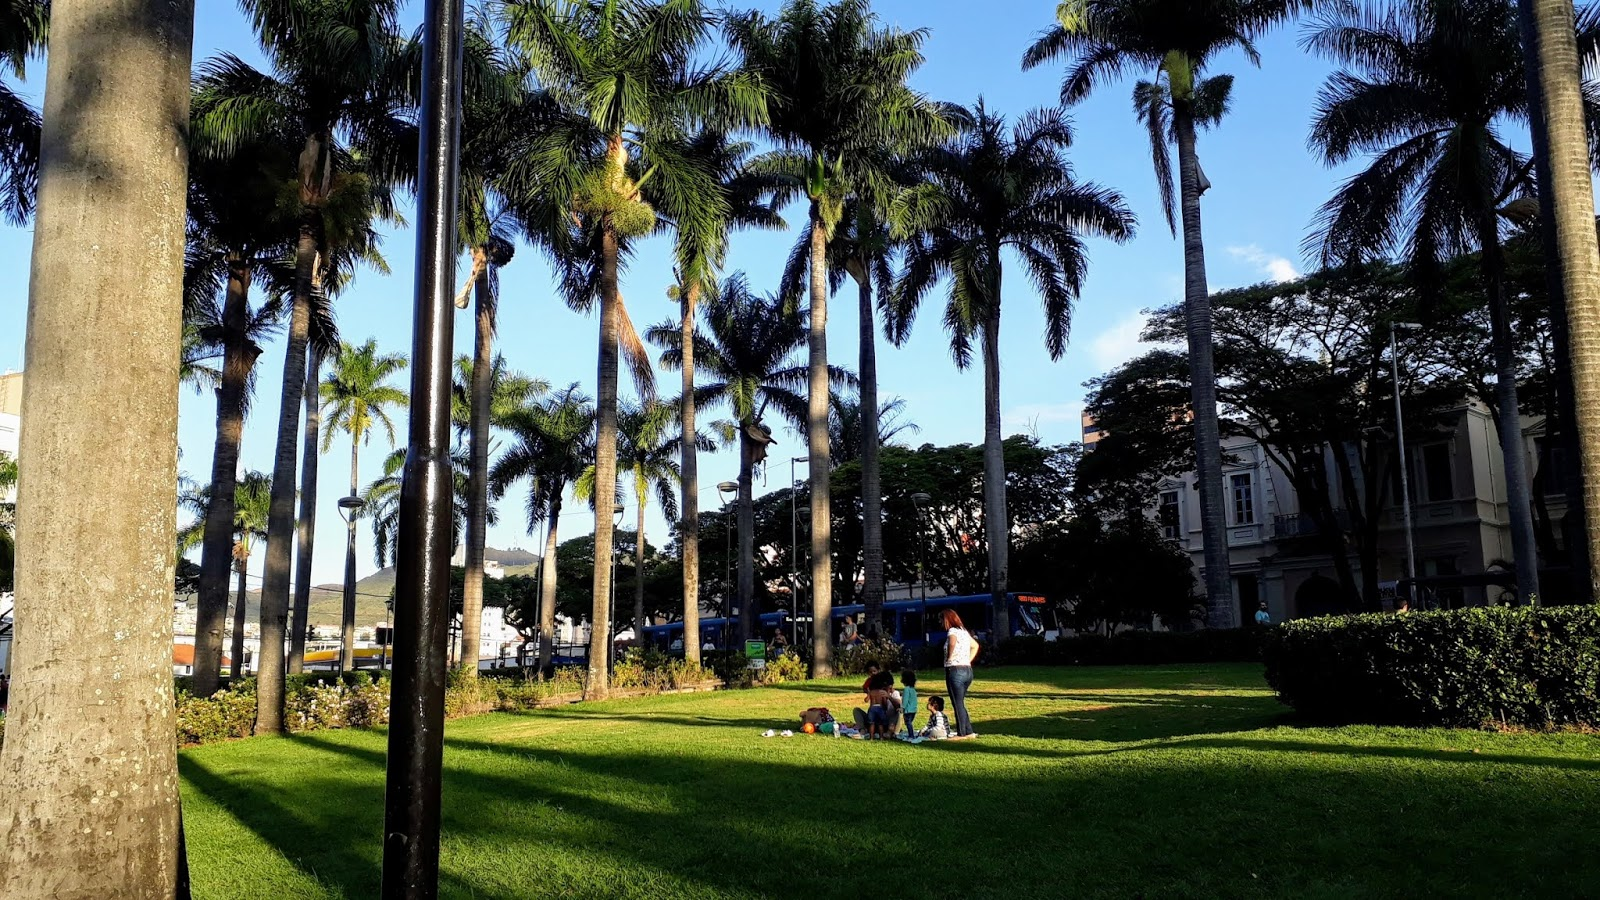 Praça Marechal Floriano Peixoto de Belo Horizonte